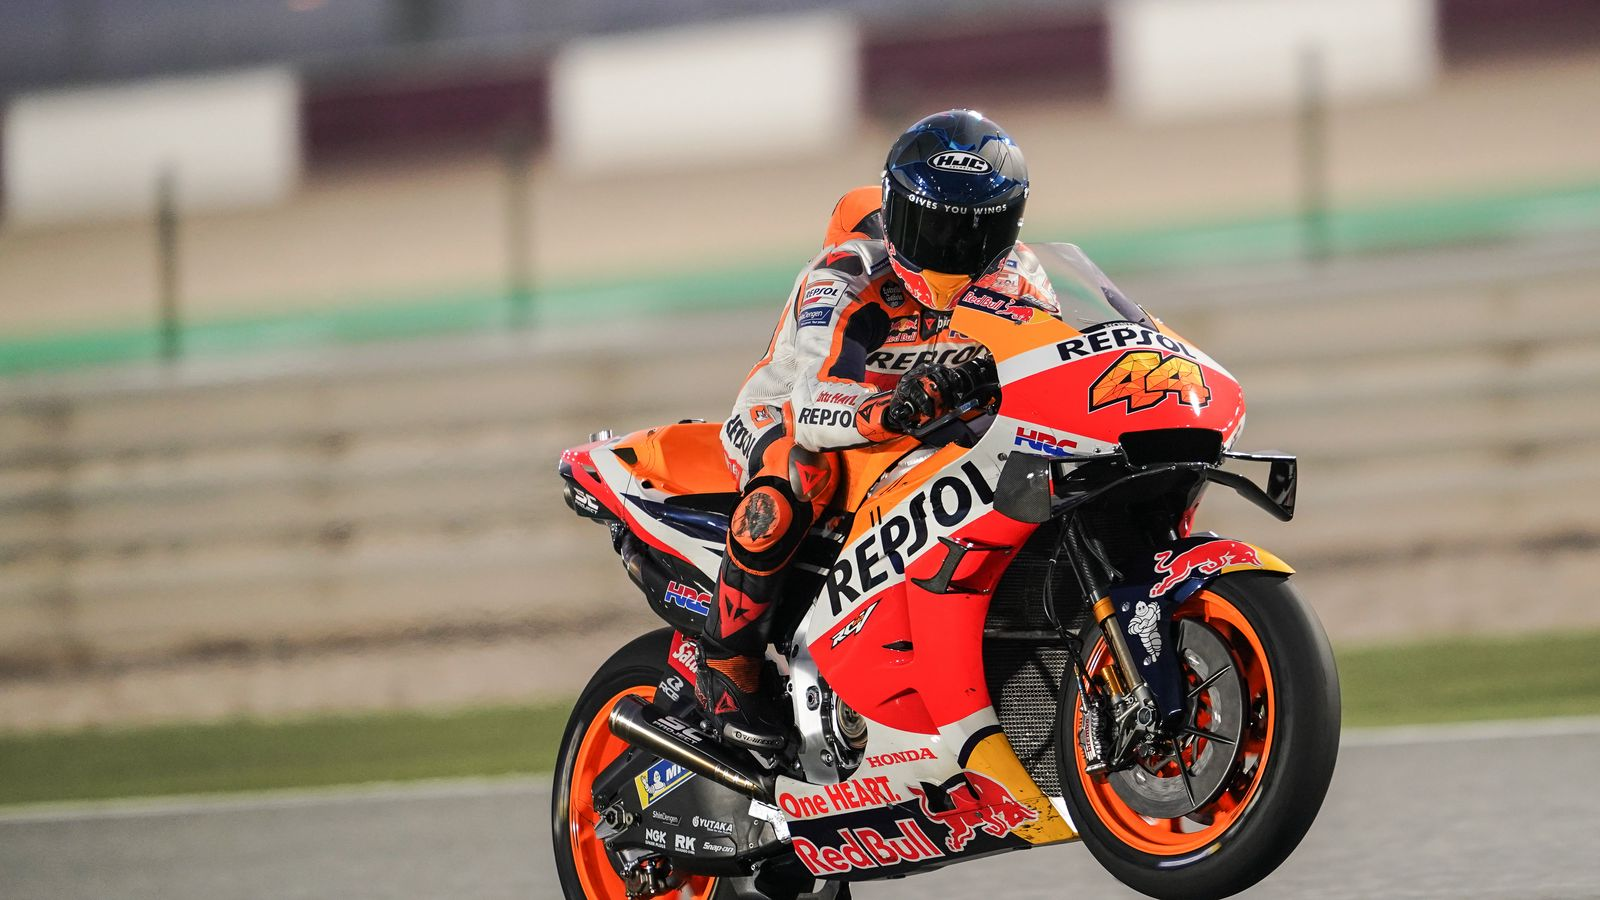 1600x900 Wallpaper honda, motorcycle, motorcyclist, helmet, speed, track, orange